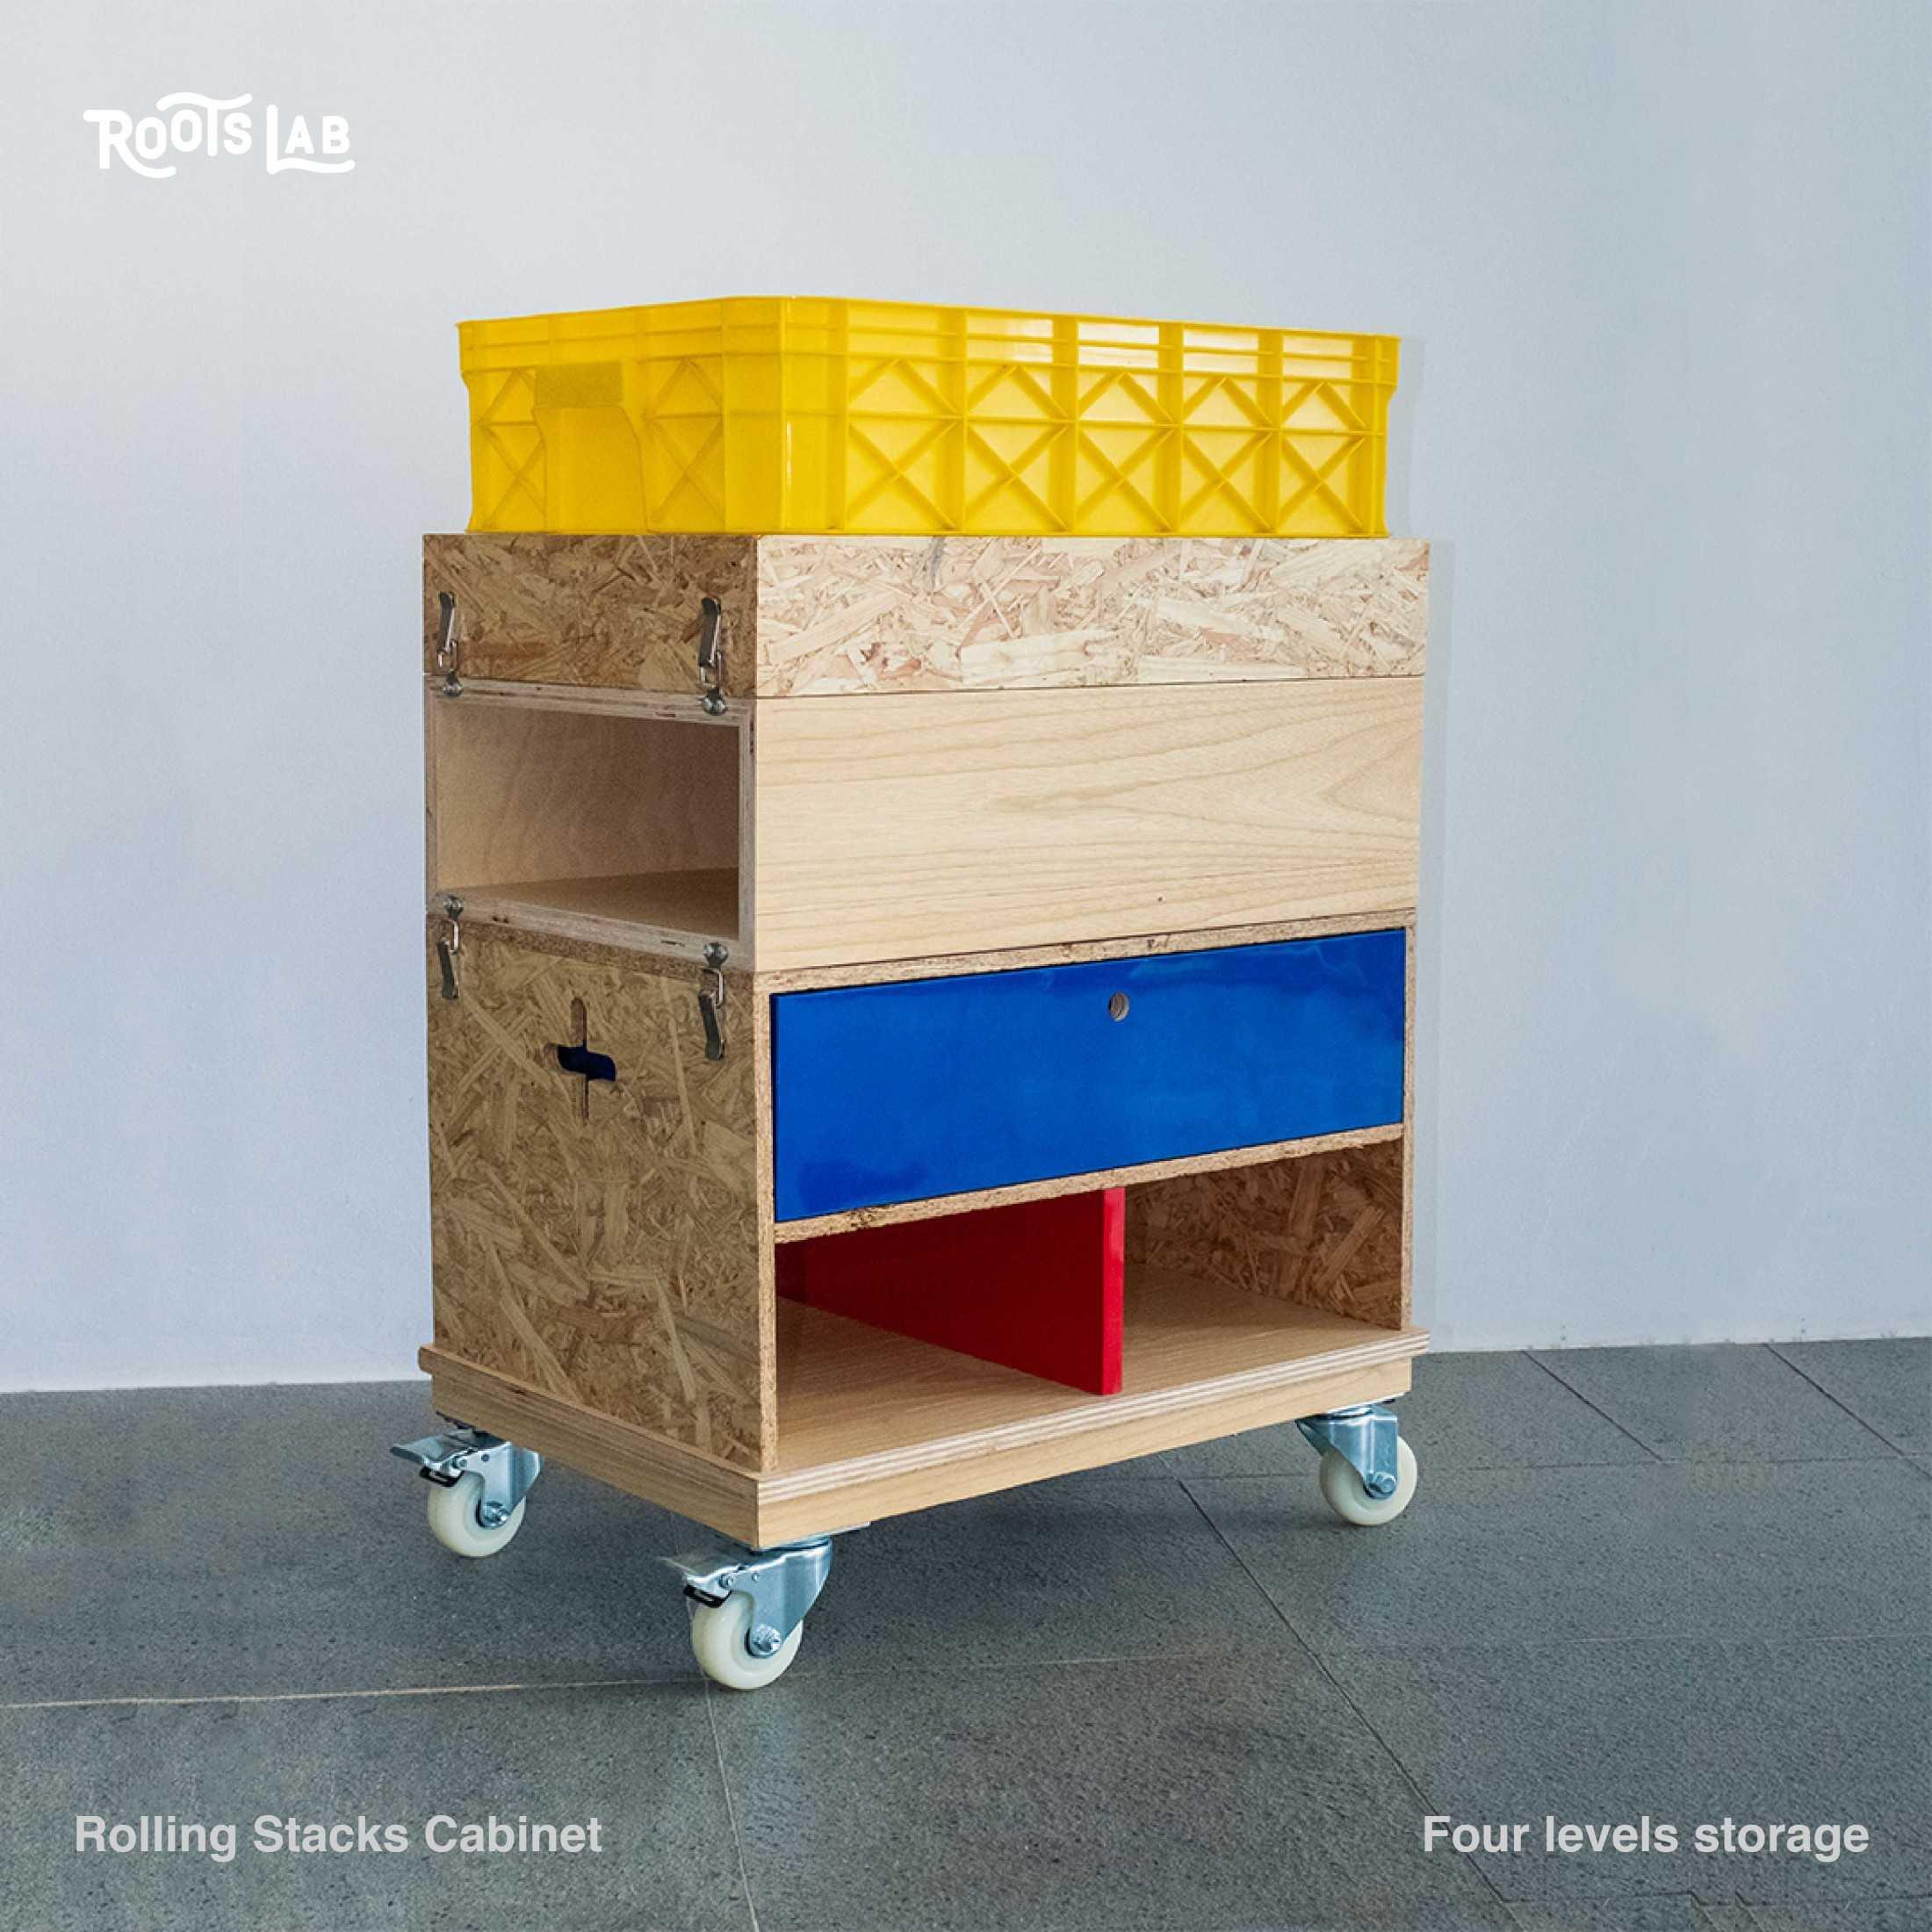 Rootslab Furniture & Craft Project Bekasi, Kota Bks, Jawa Barat, Indonesia Bekasi, Kota Bks, Jawa Barat, Indonesia Rolling Stacks Cabinet  113031